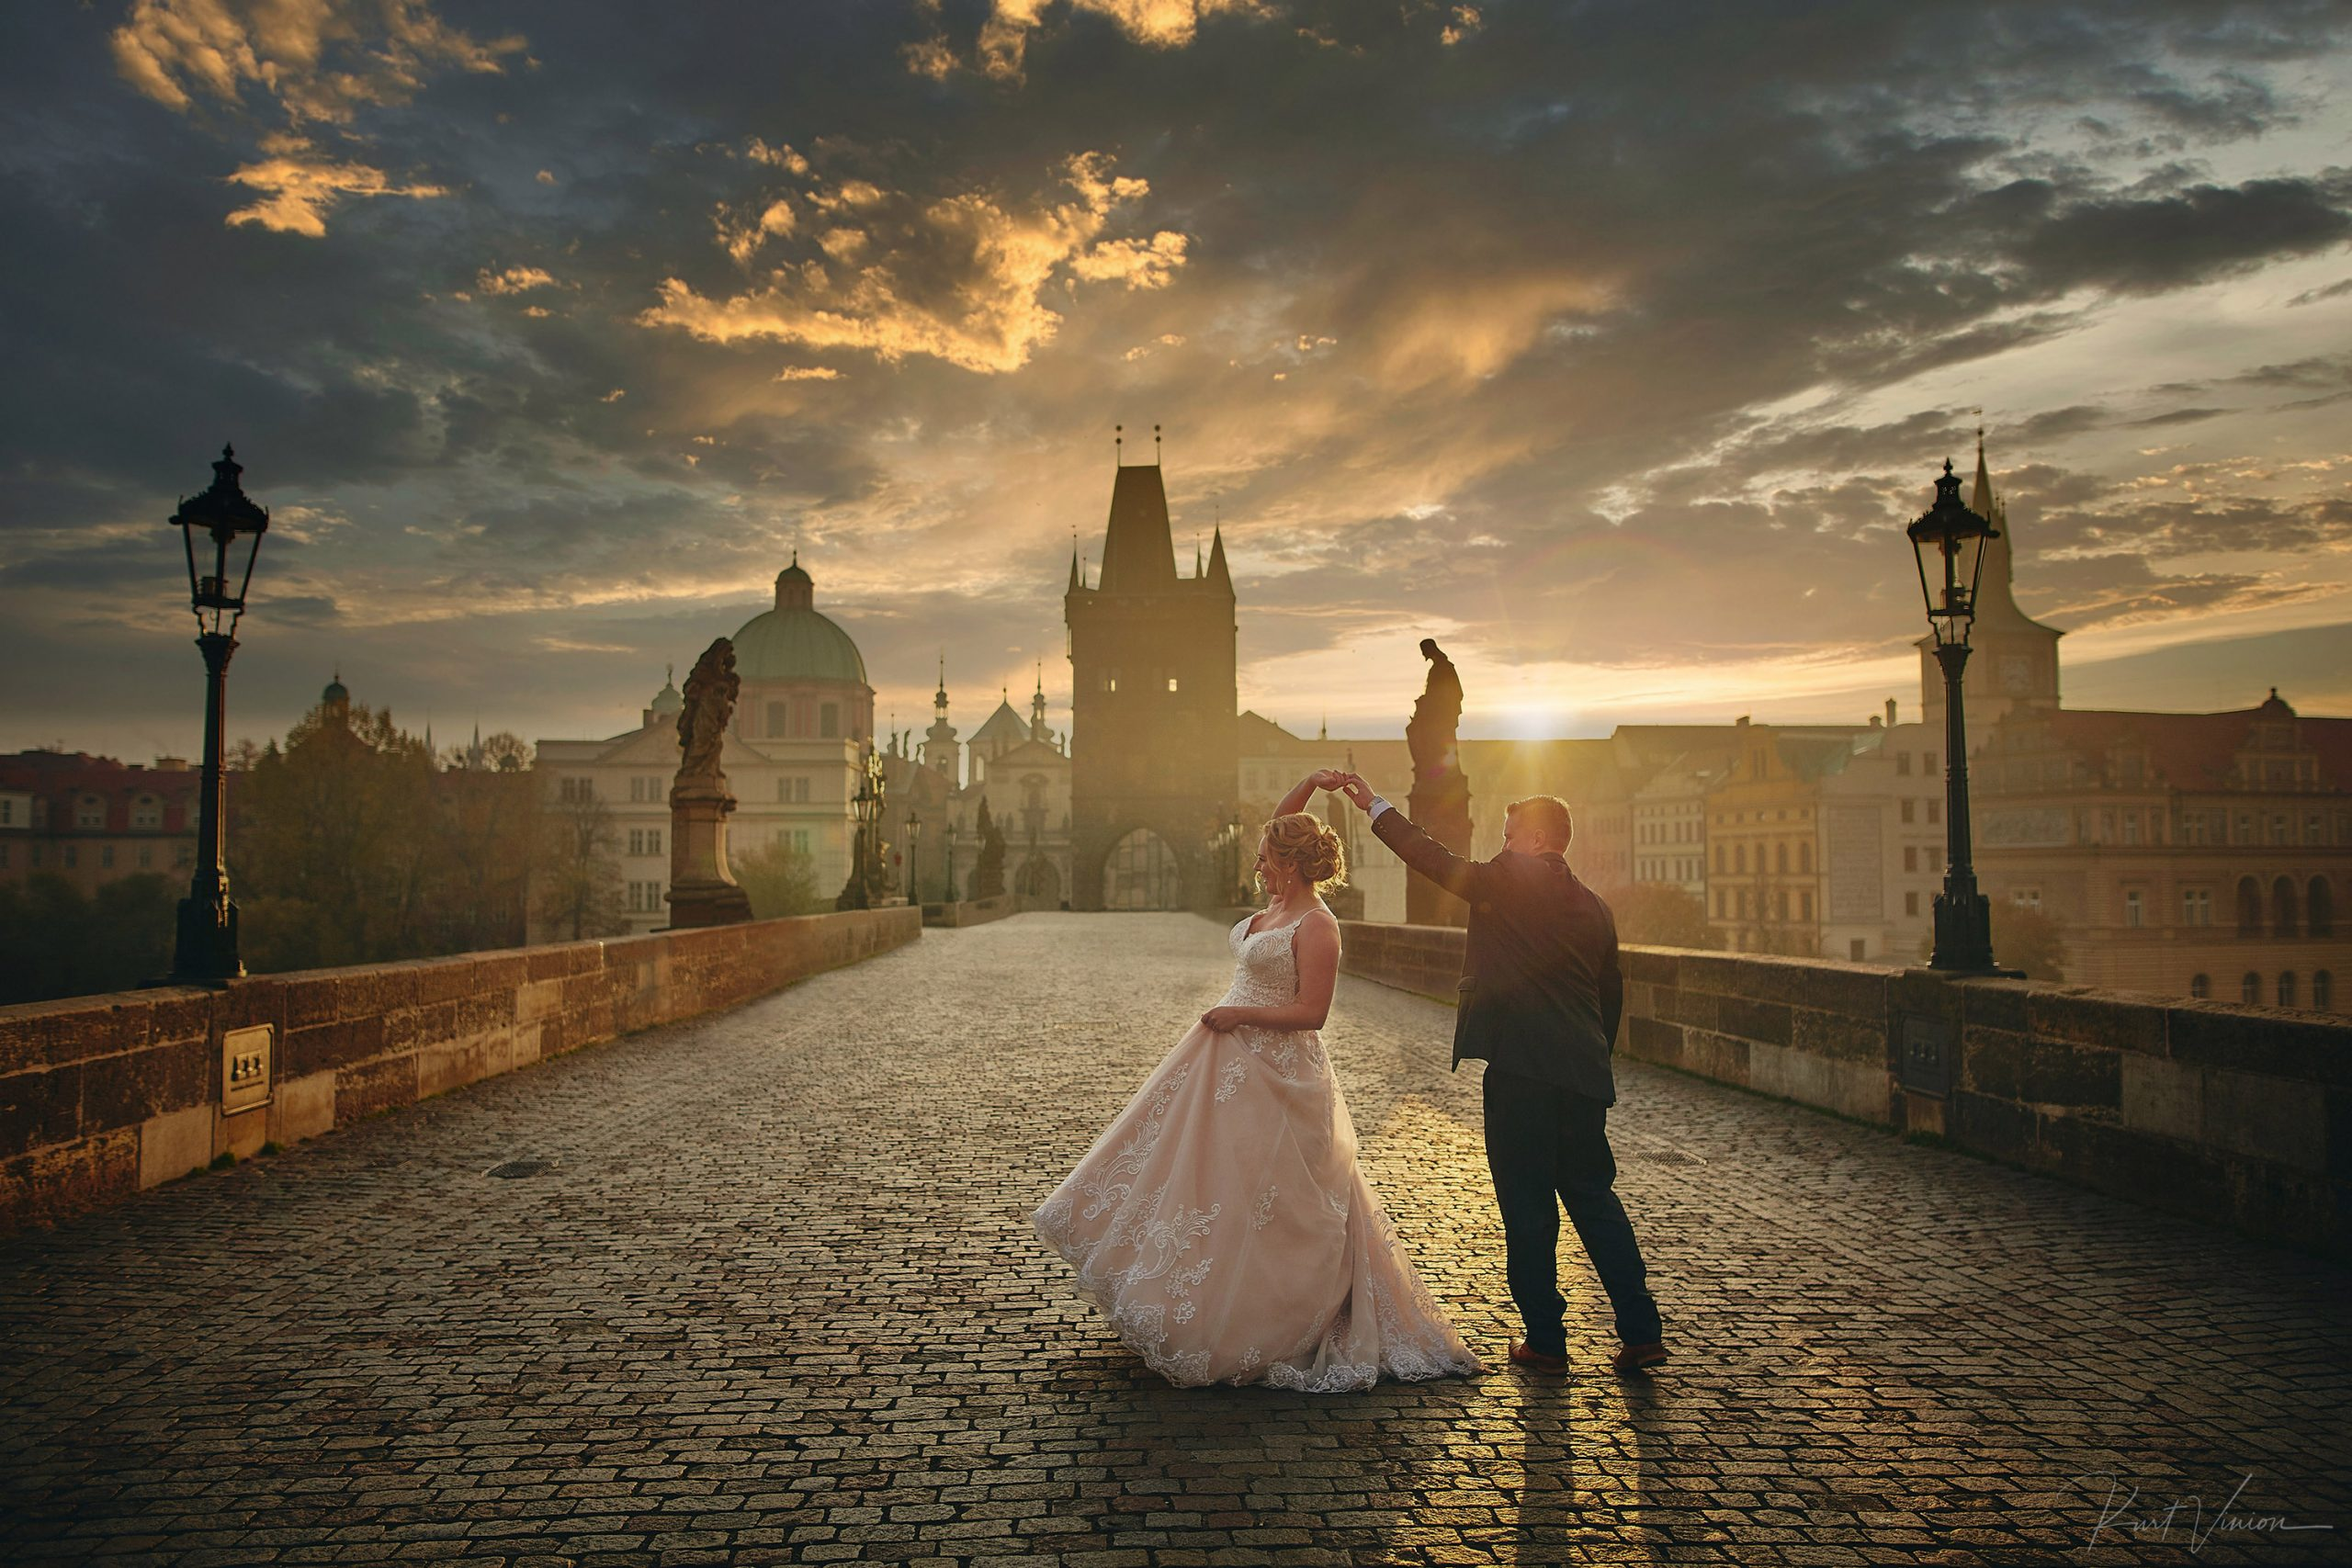 wedded-couple-dancing-at-sunrise-Charles-Bridge